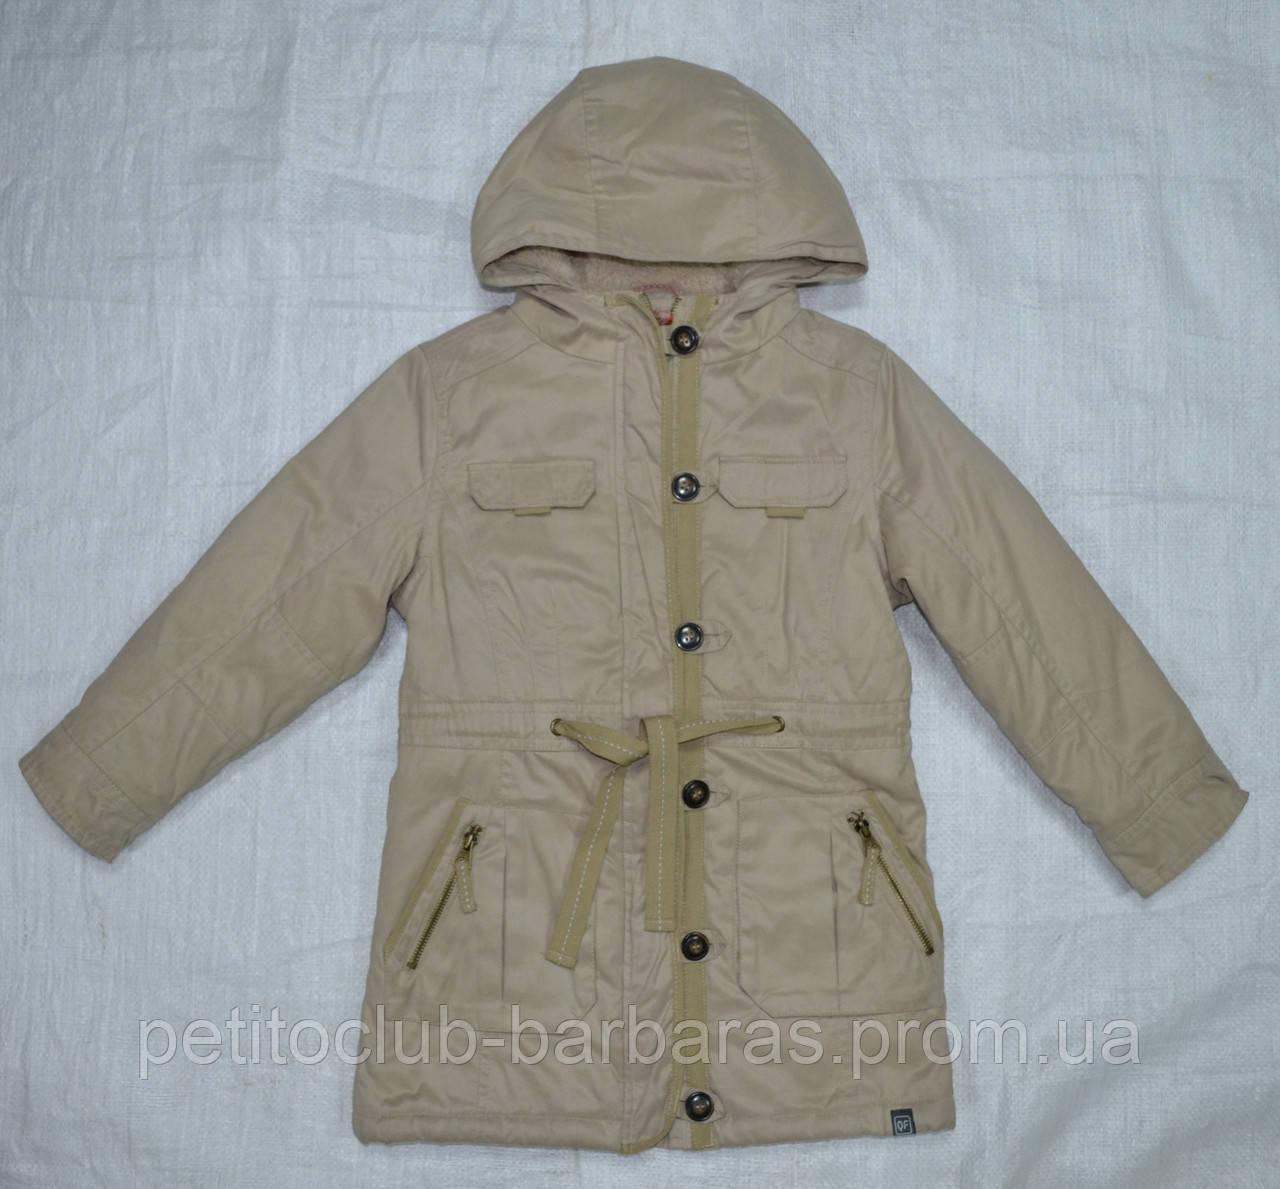 Куртка-парка еврозима для девочки Marta бежевая (QuadriFoglio, Польша)